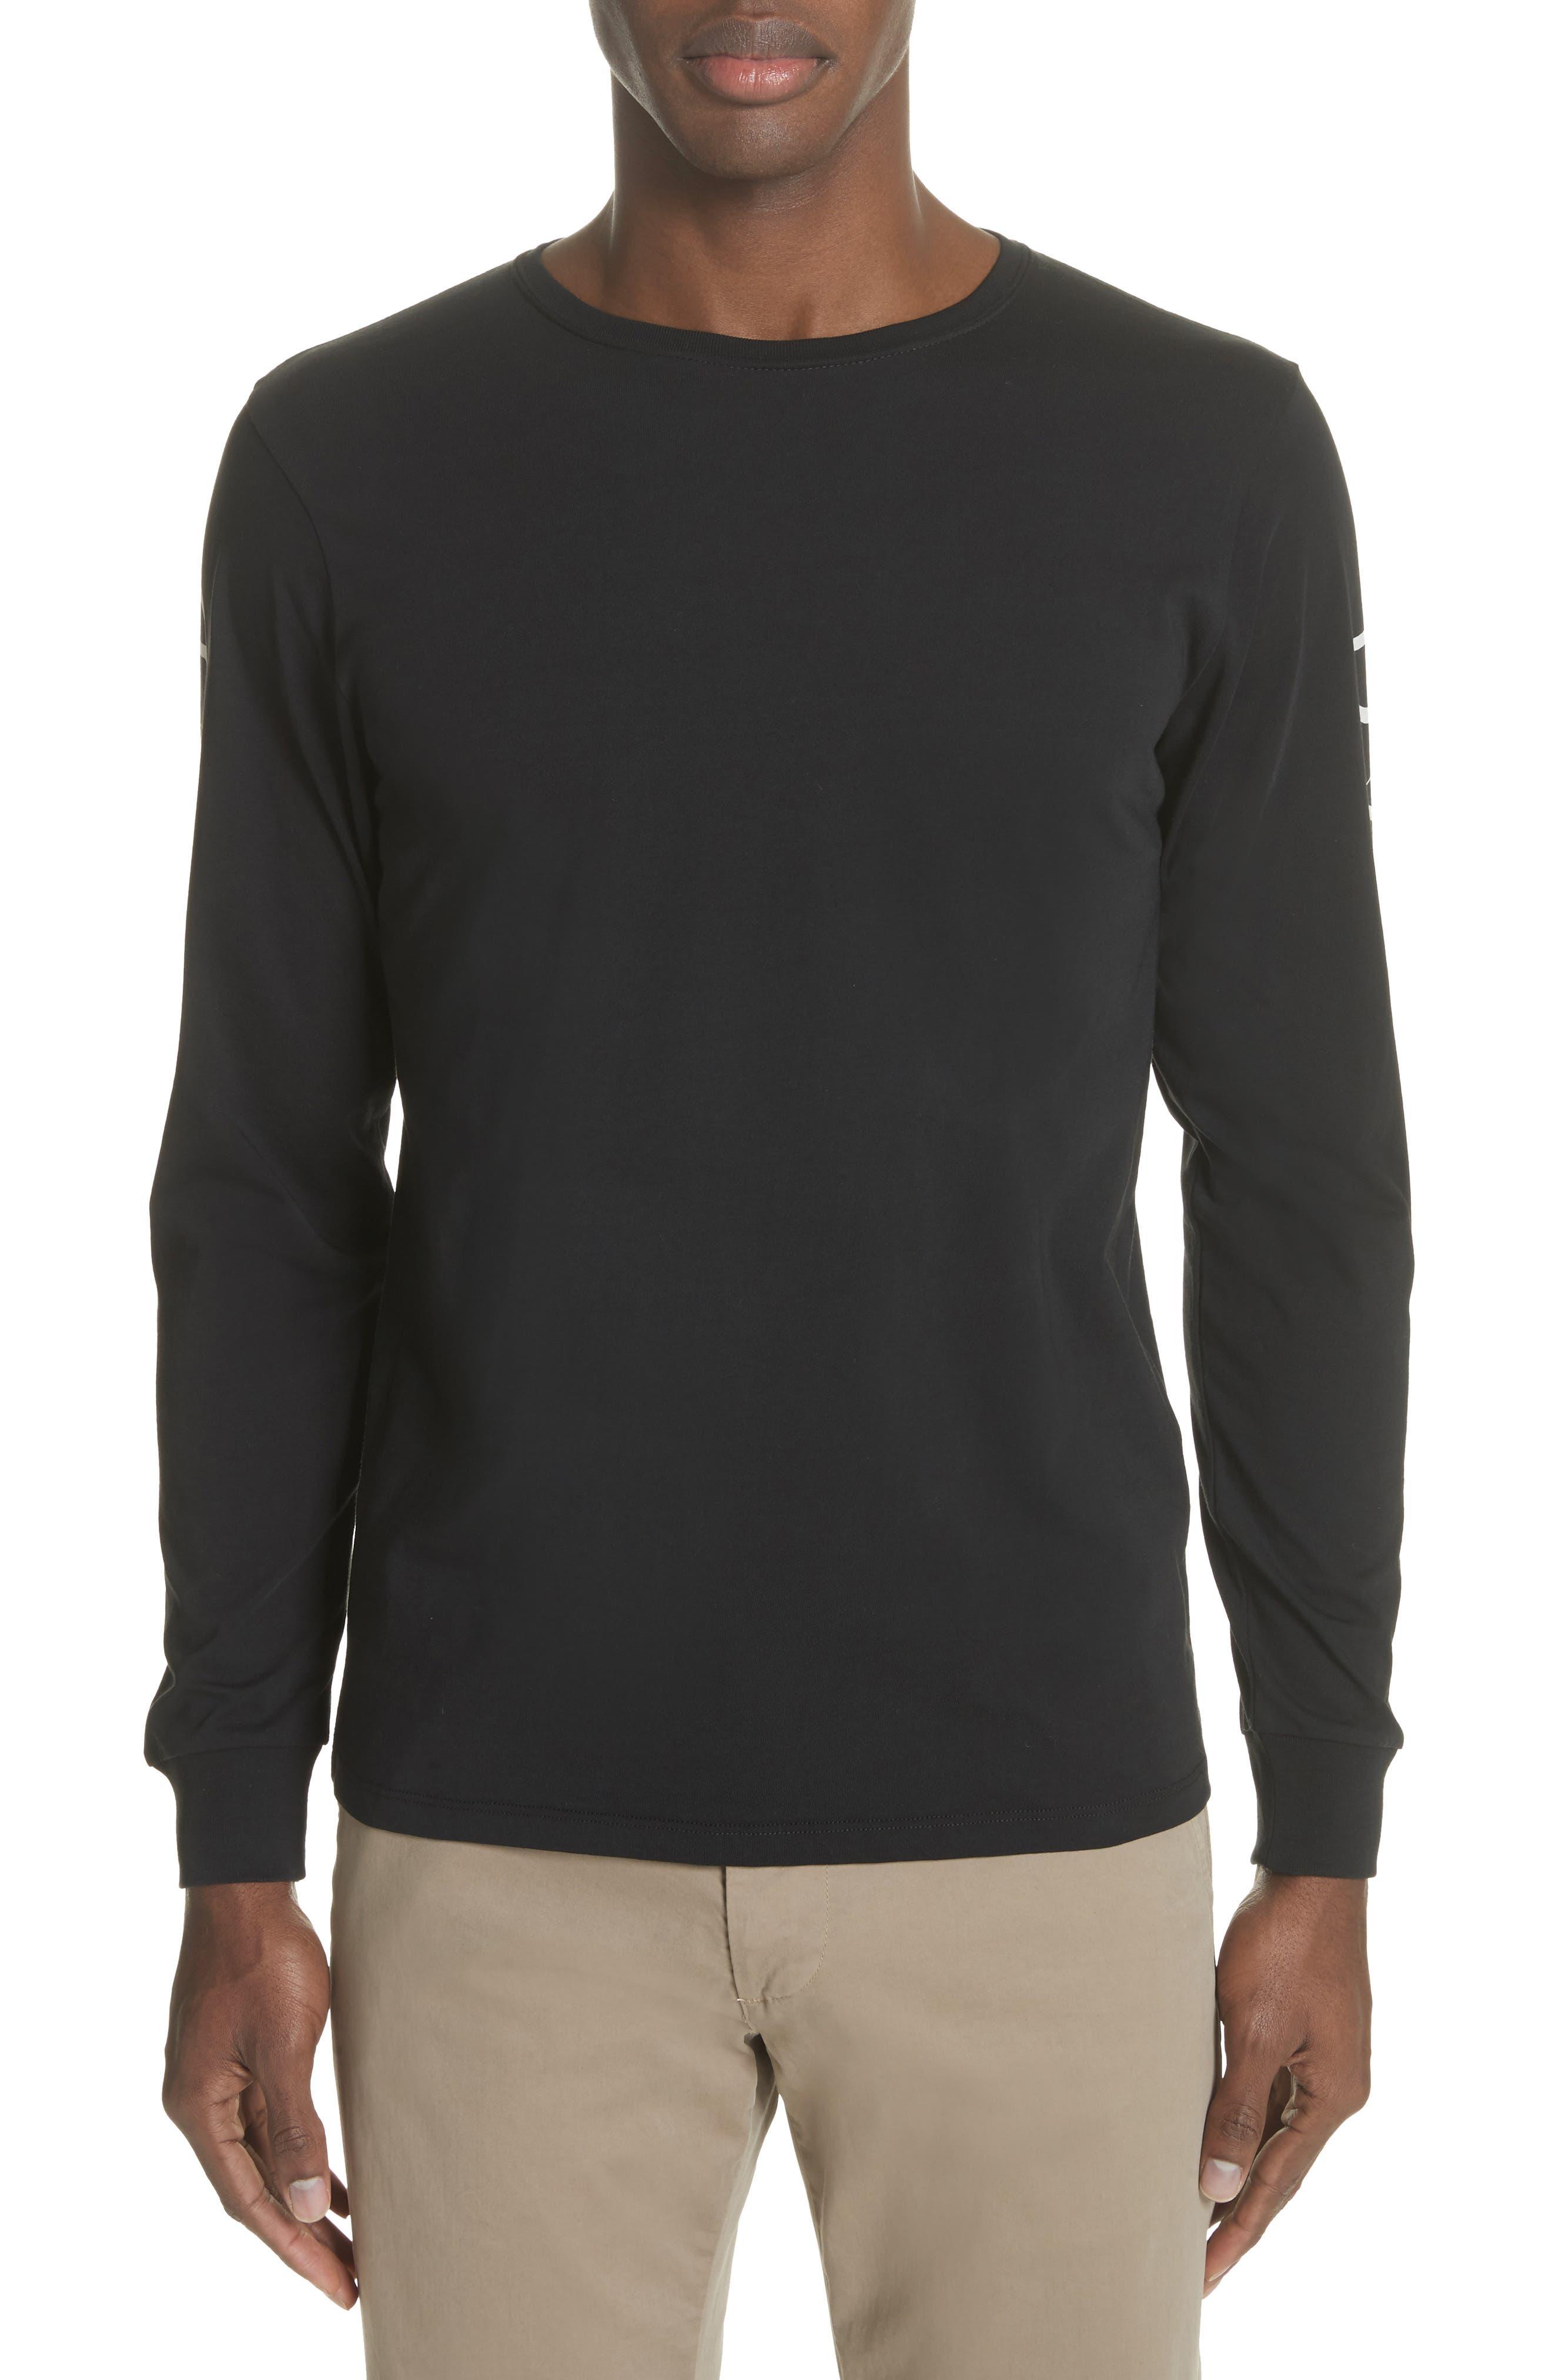 Main Image - Saturdays NYC Reverse Print Long Sleeve T-Shirt